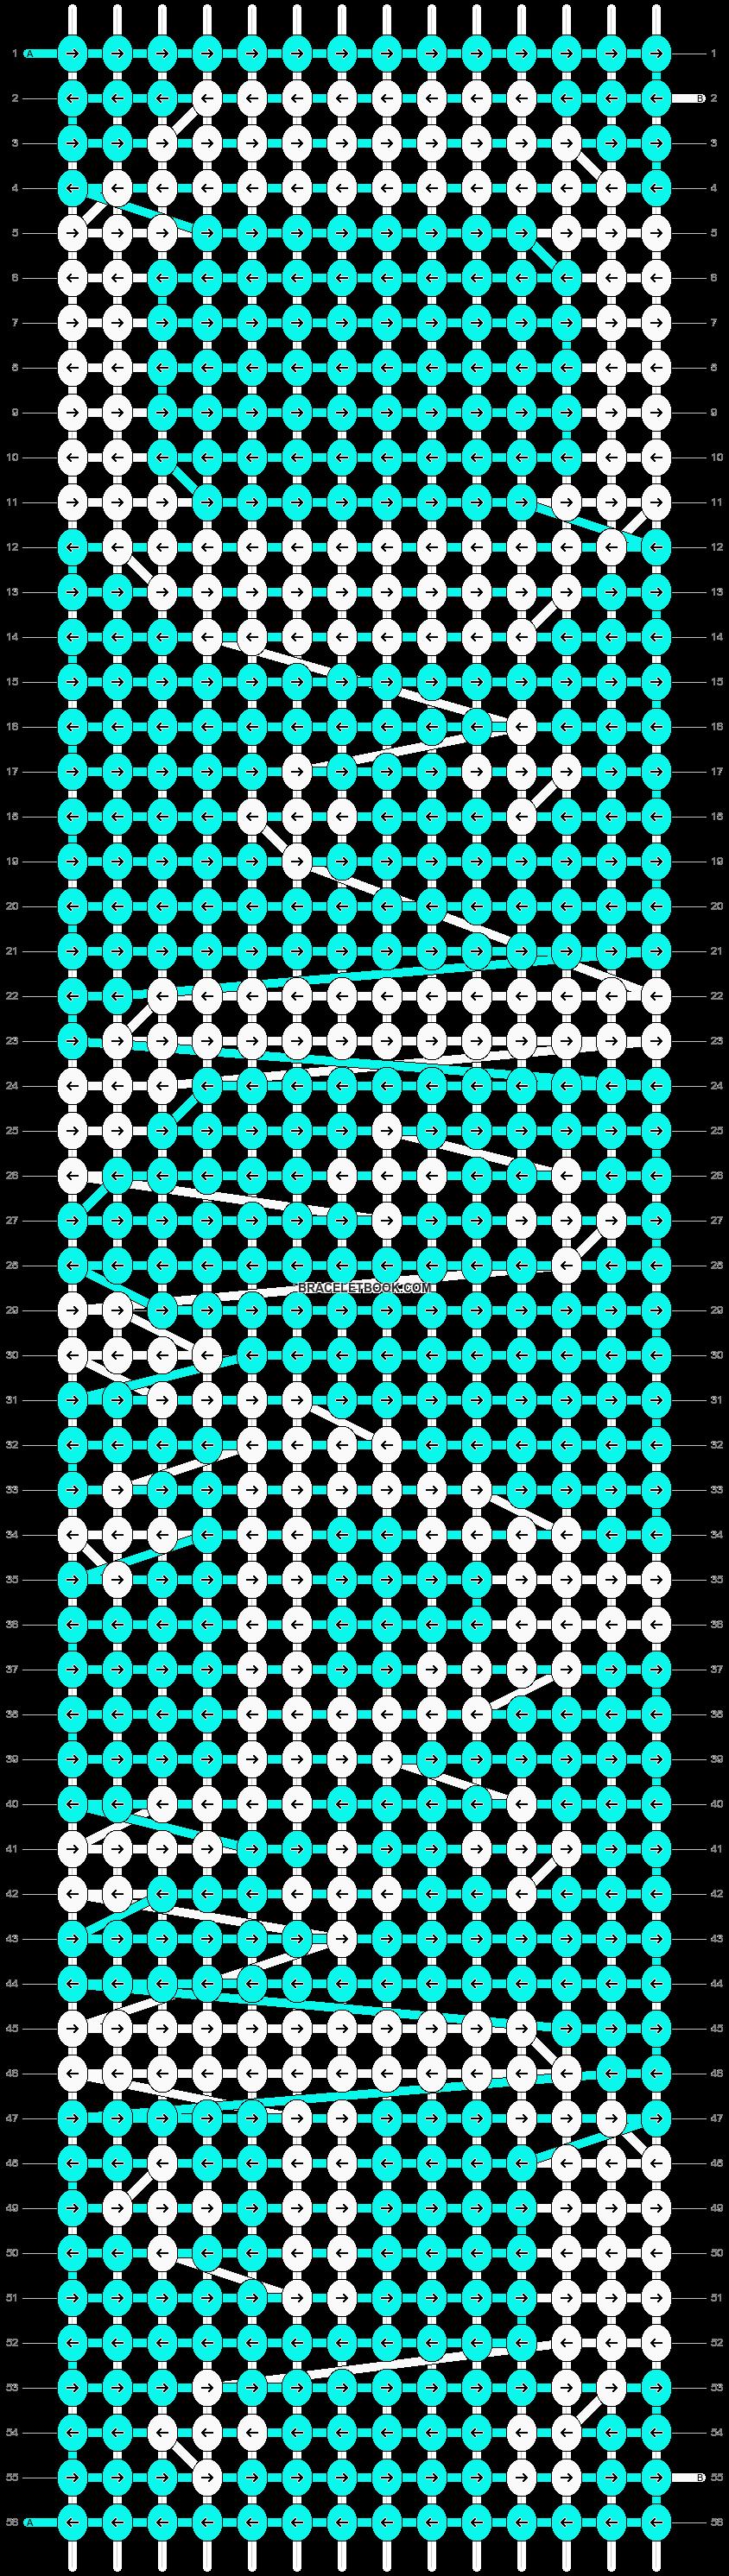 Alpha pattern #13223 pattern